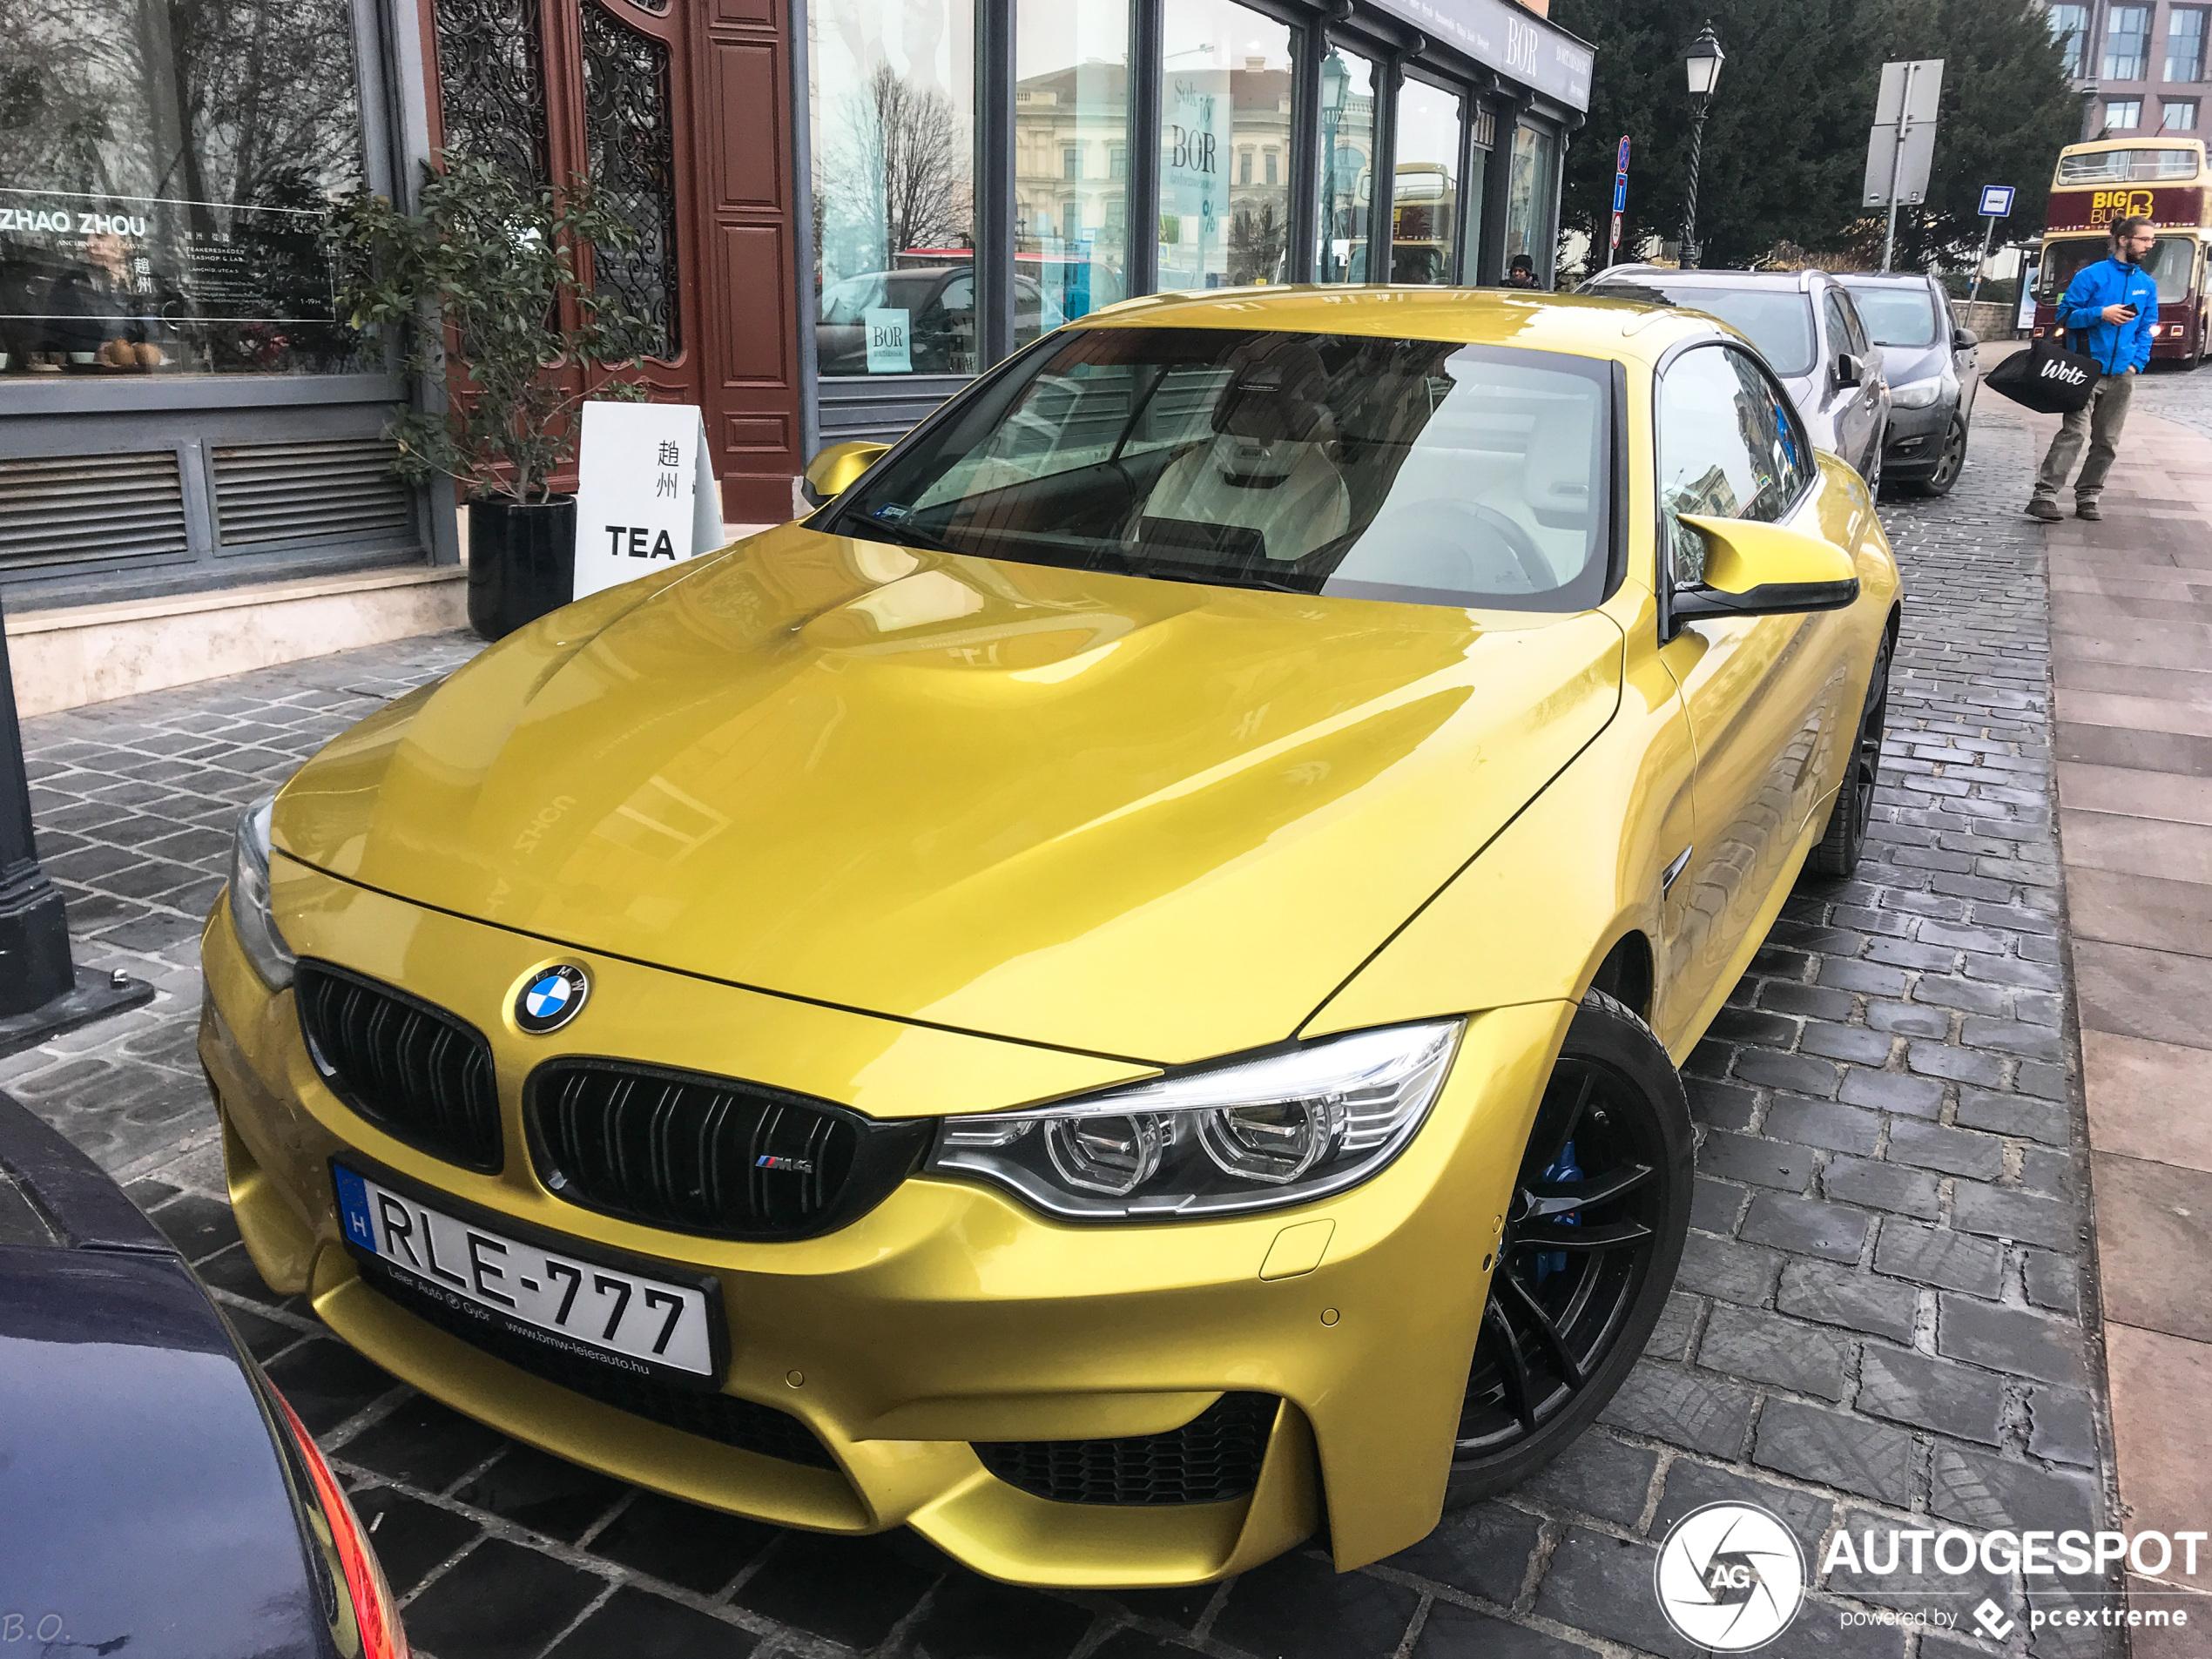 BMW M4 F83 Convertible - 22 January 2020 - Autogespot